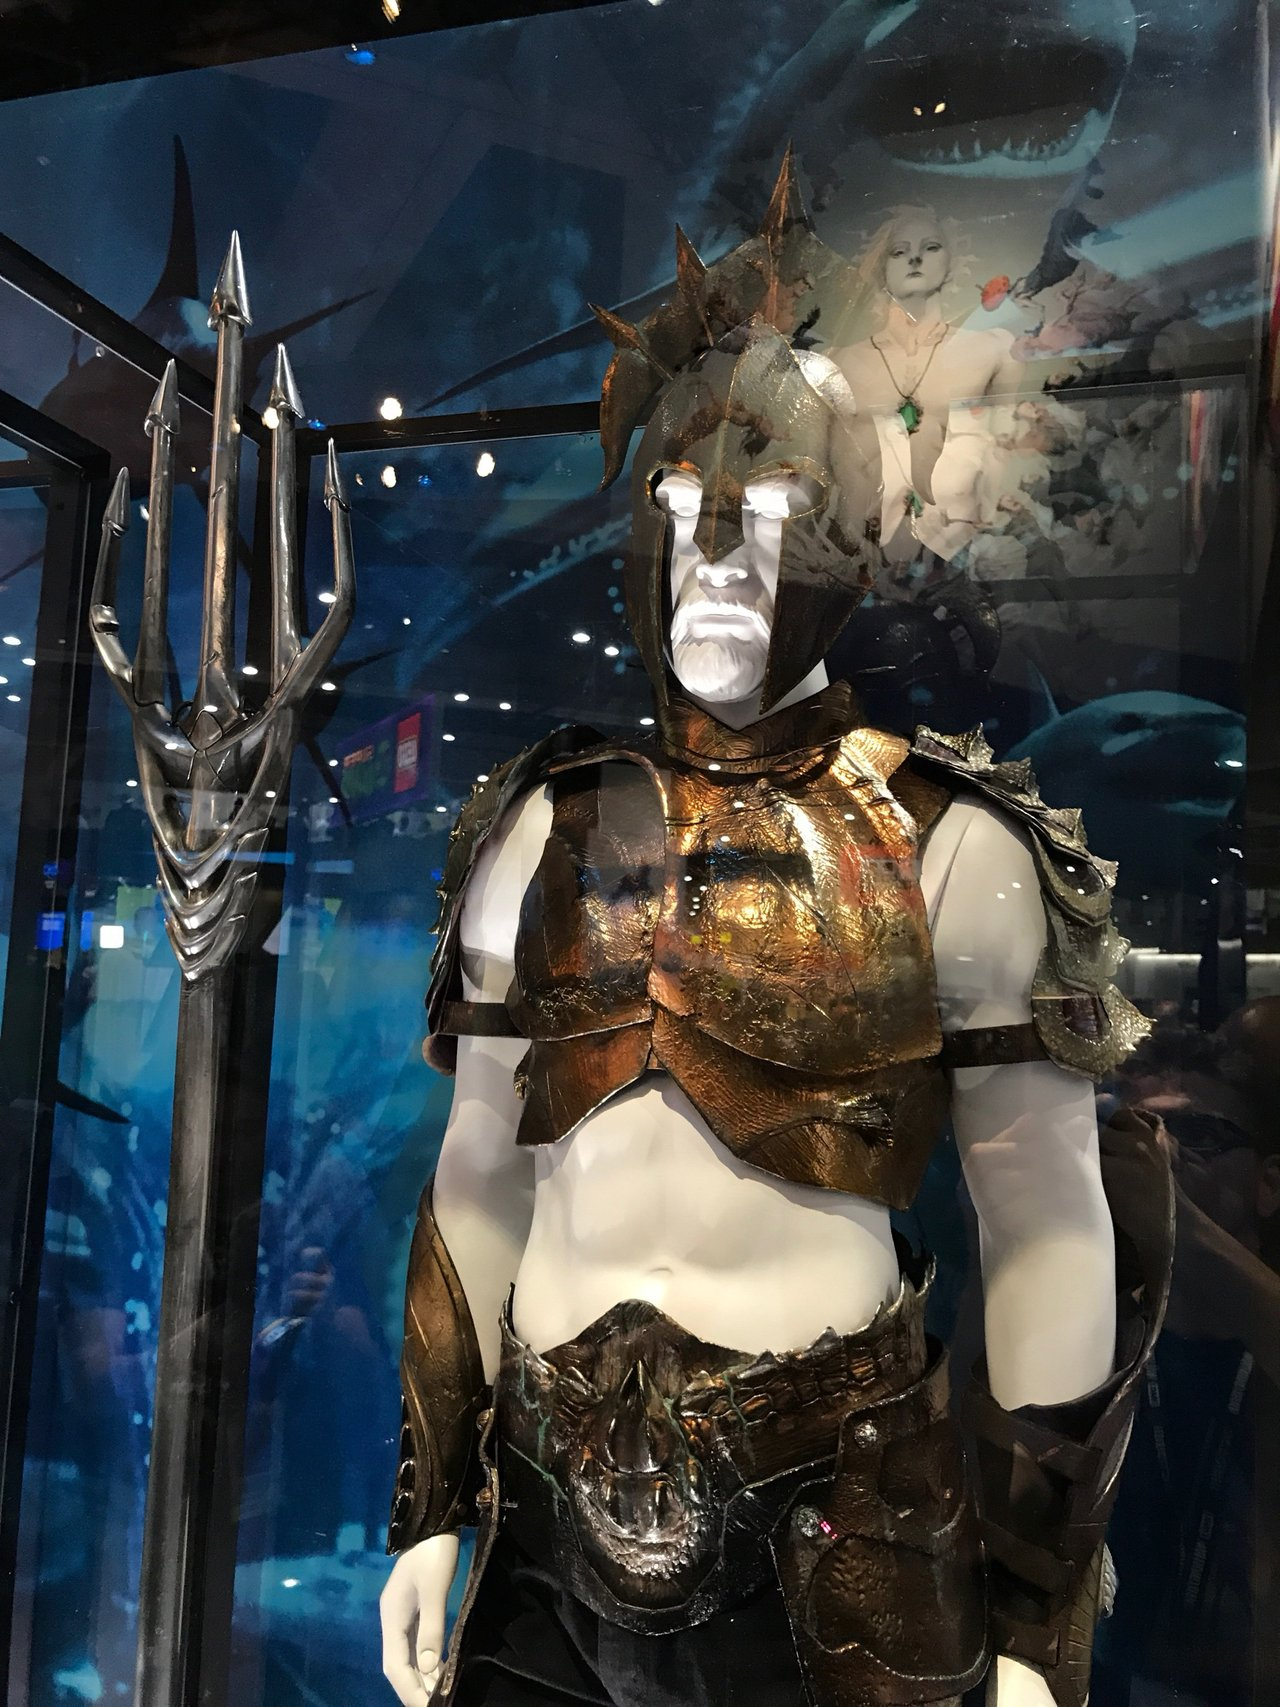 Shazam Aquaman Get New Magazine Covers: WB Displays Shazam, Aquaman, Titans Costumes